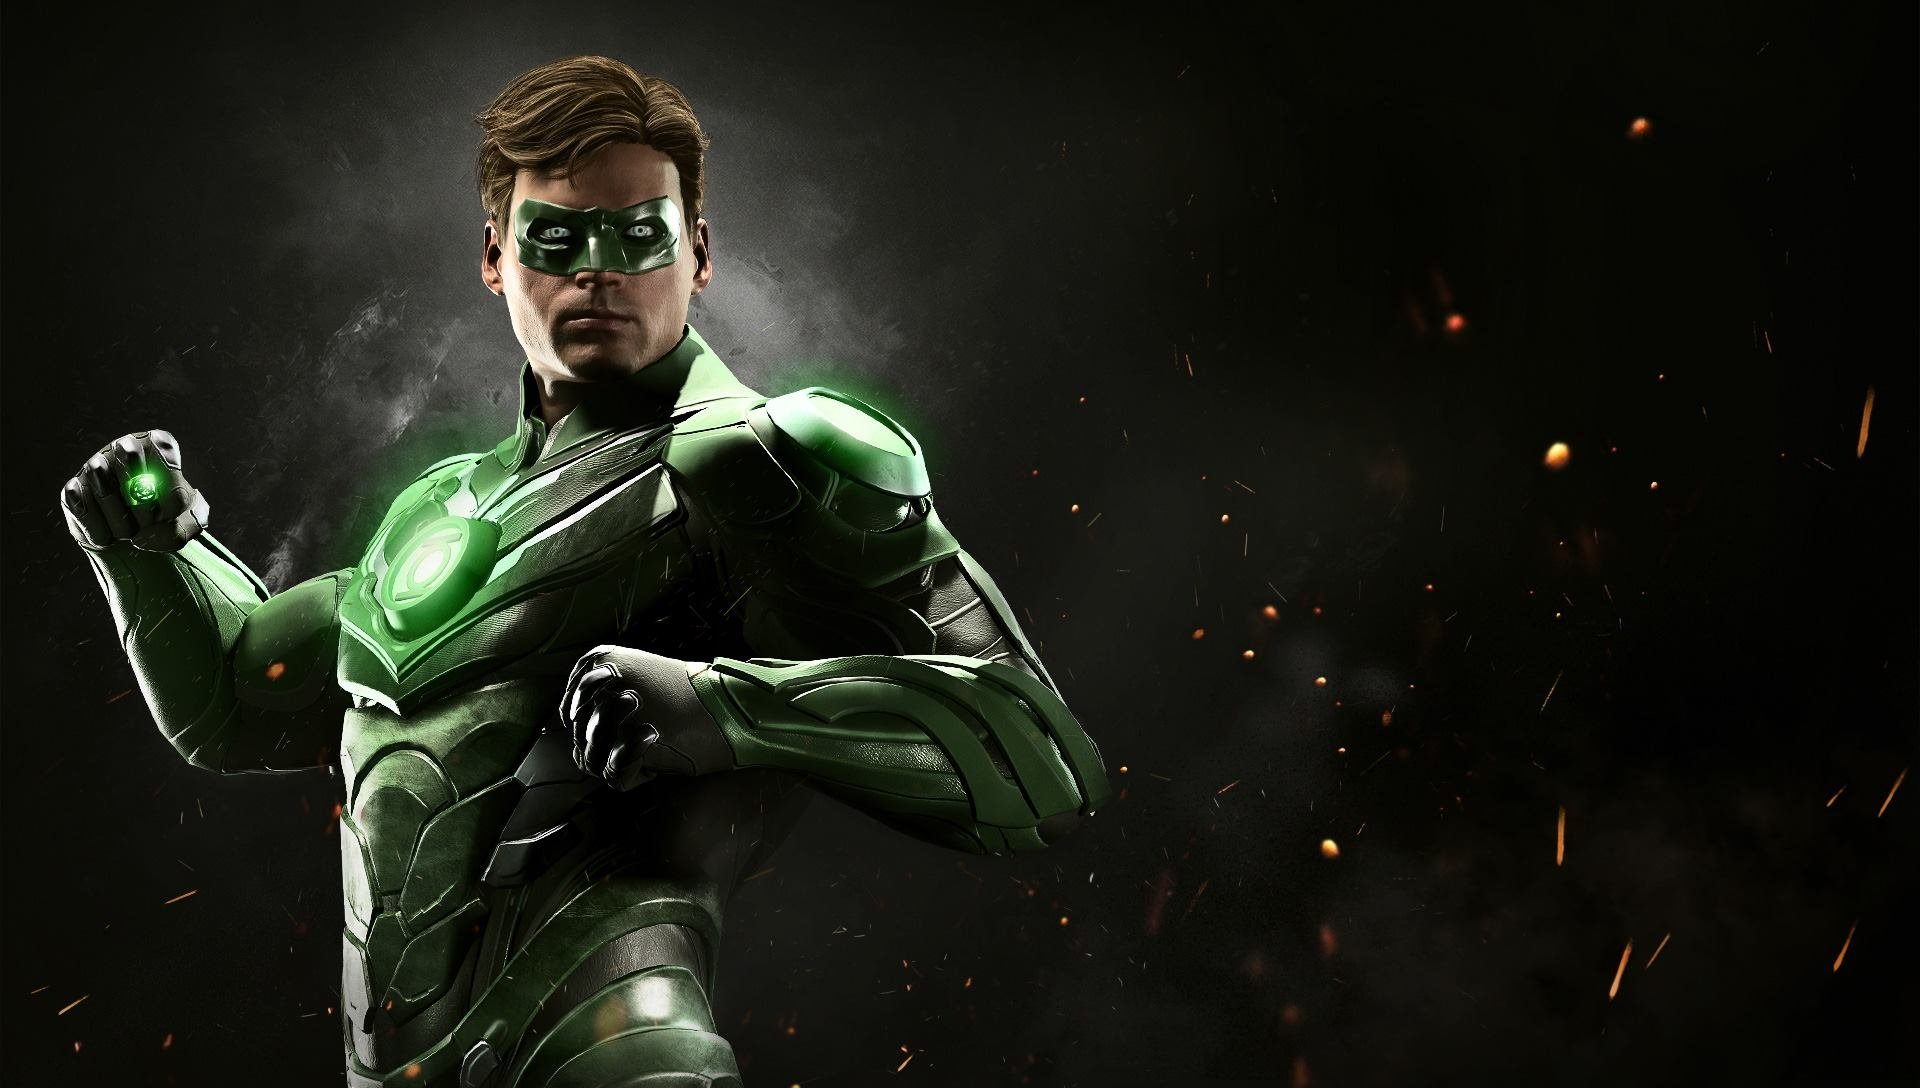 Injustice 2 Superman Hd Games 4k Wallpapers Images: Green Lantern HD Wallpaper